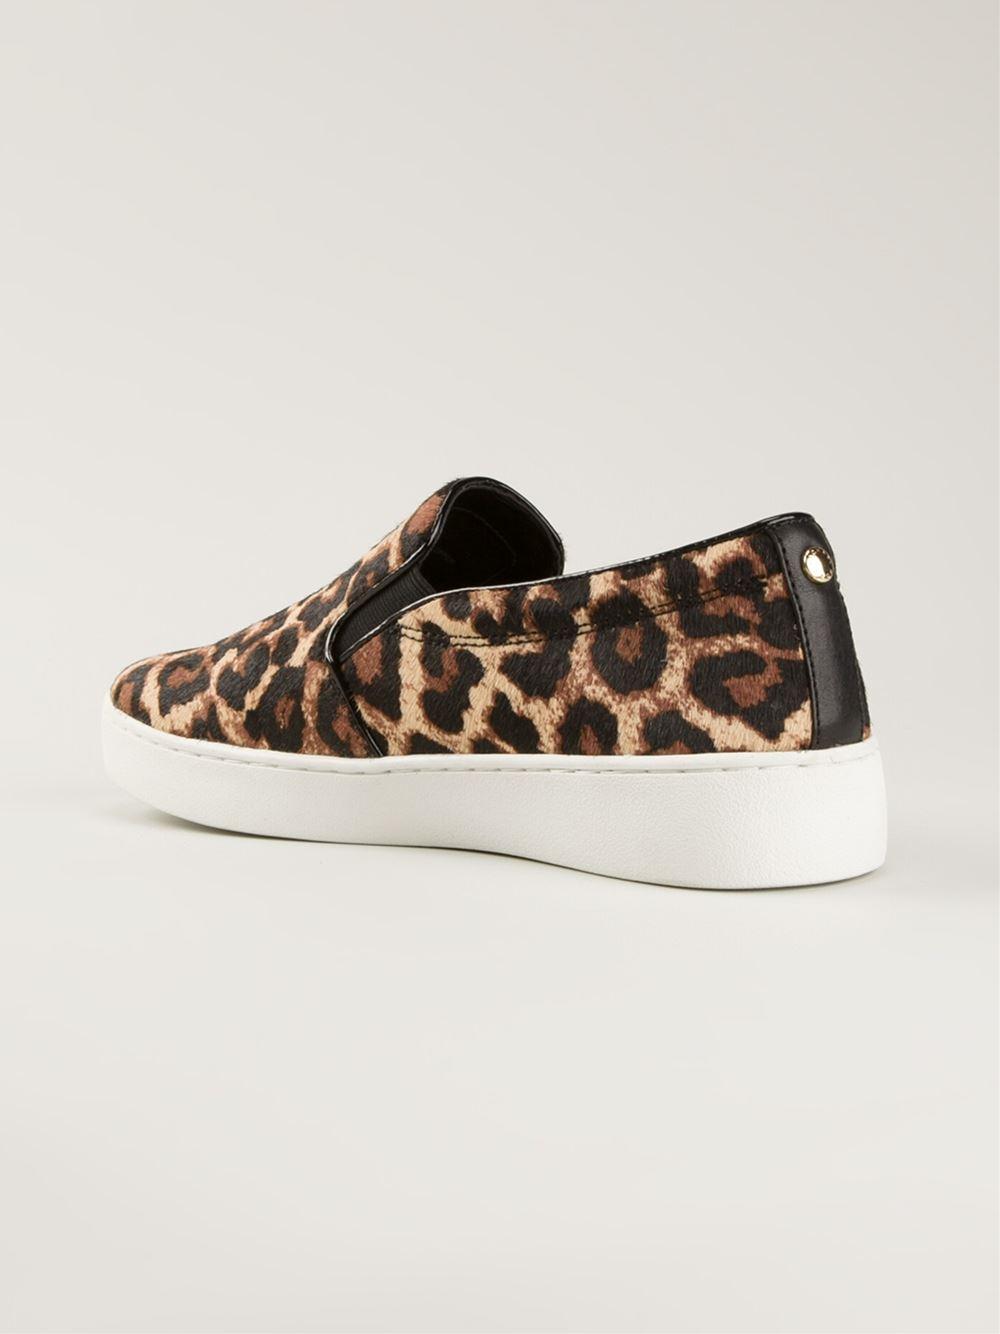 a6010d48765 Lyst - Michael Kors Keaton Leopard Print Slipon Sneakers in Black